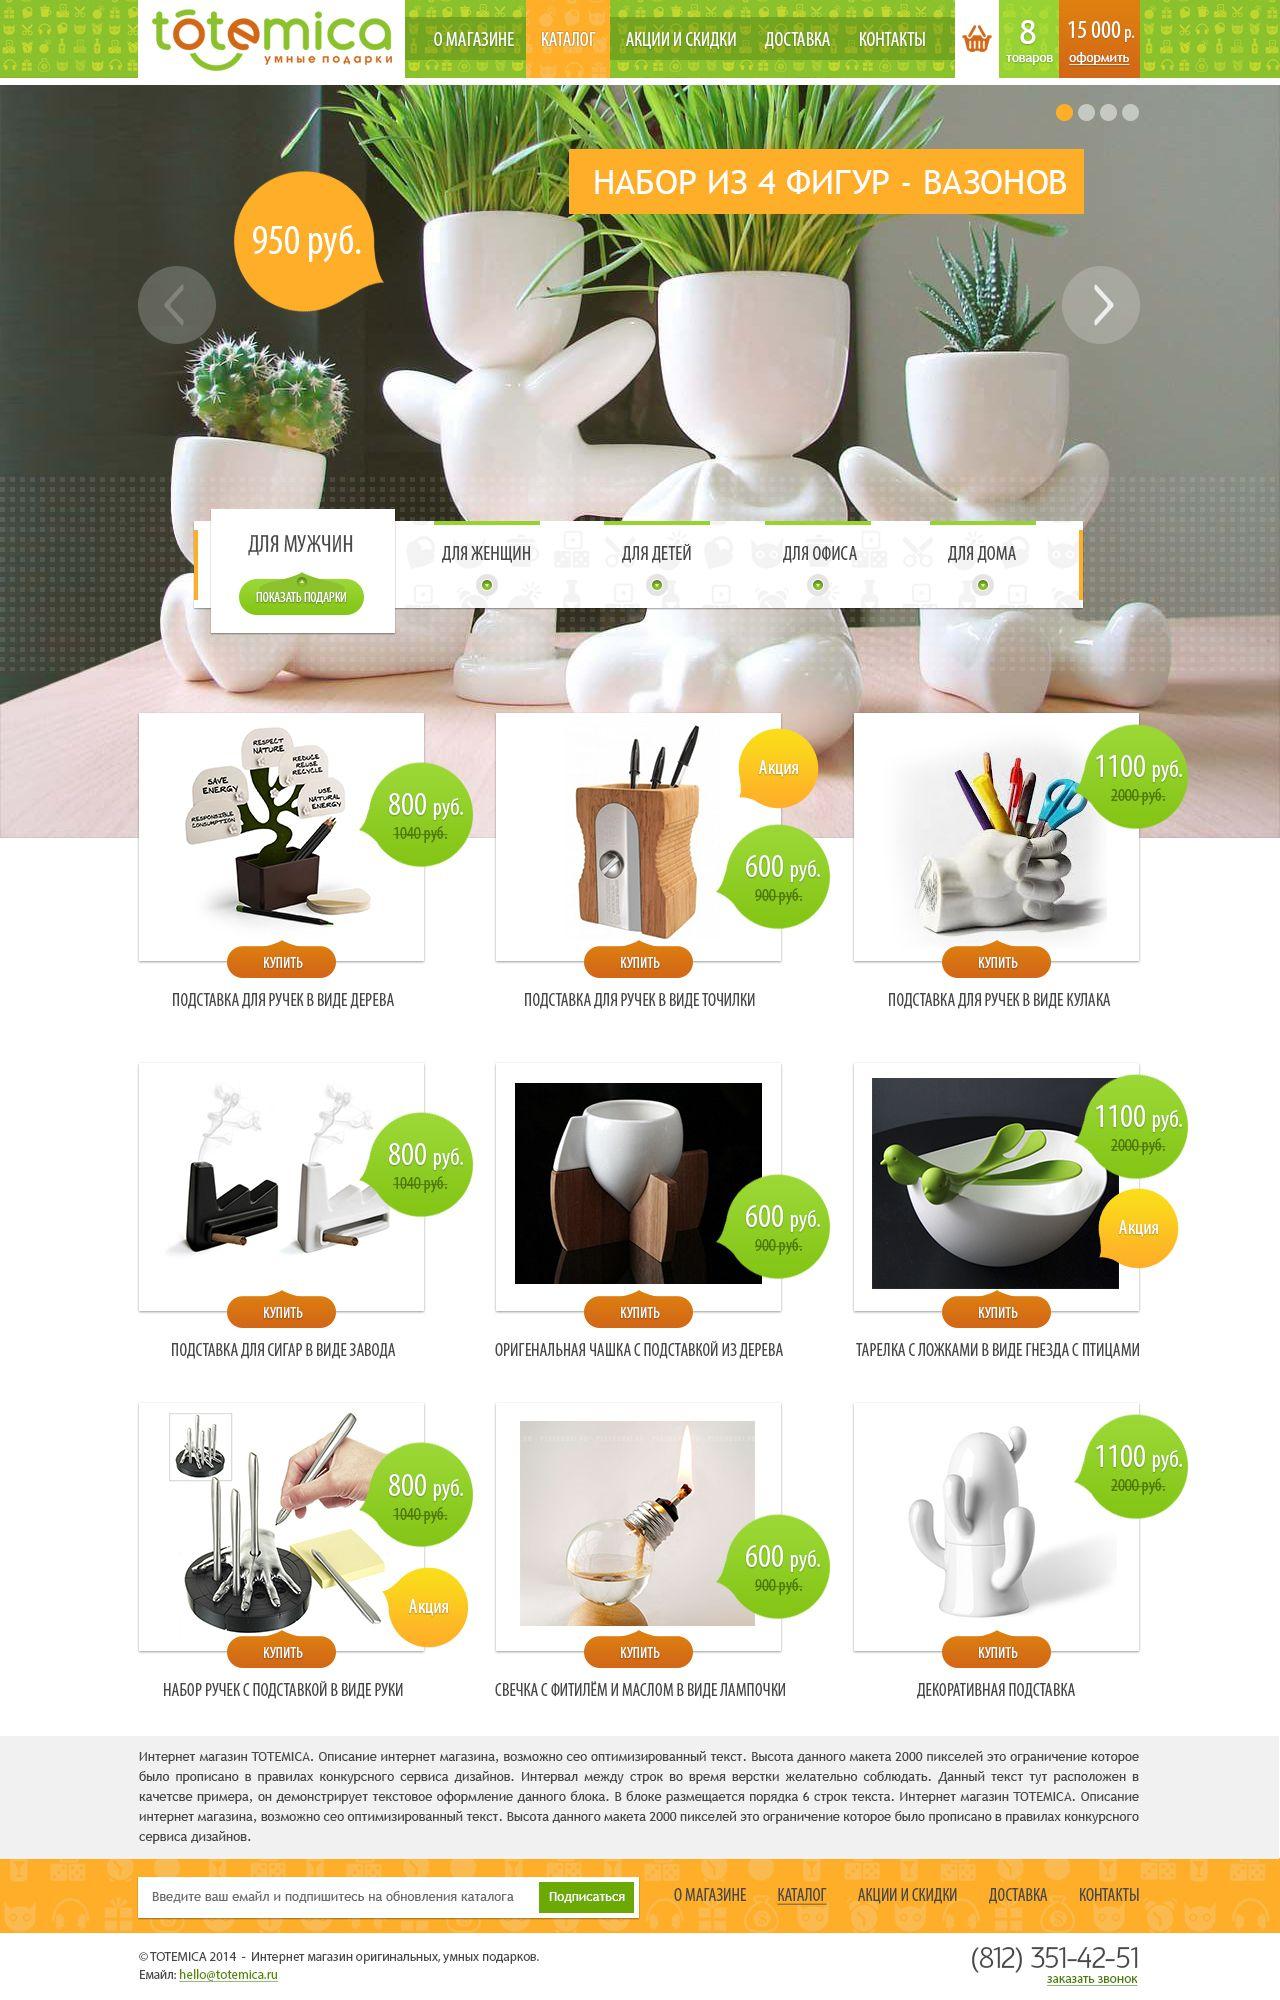 Дизайн сайта интернет магазина - дизайнер LineDee